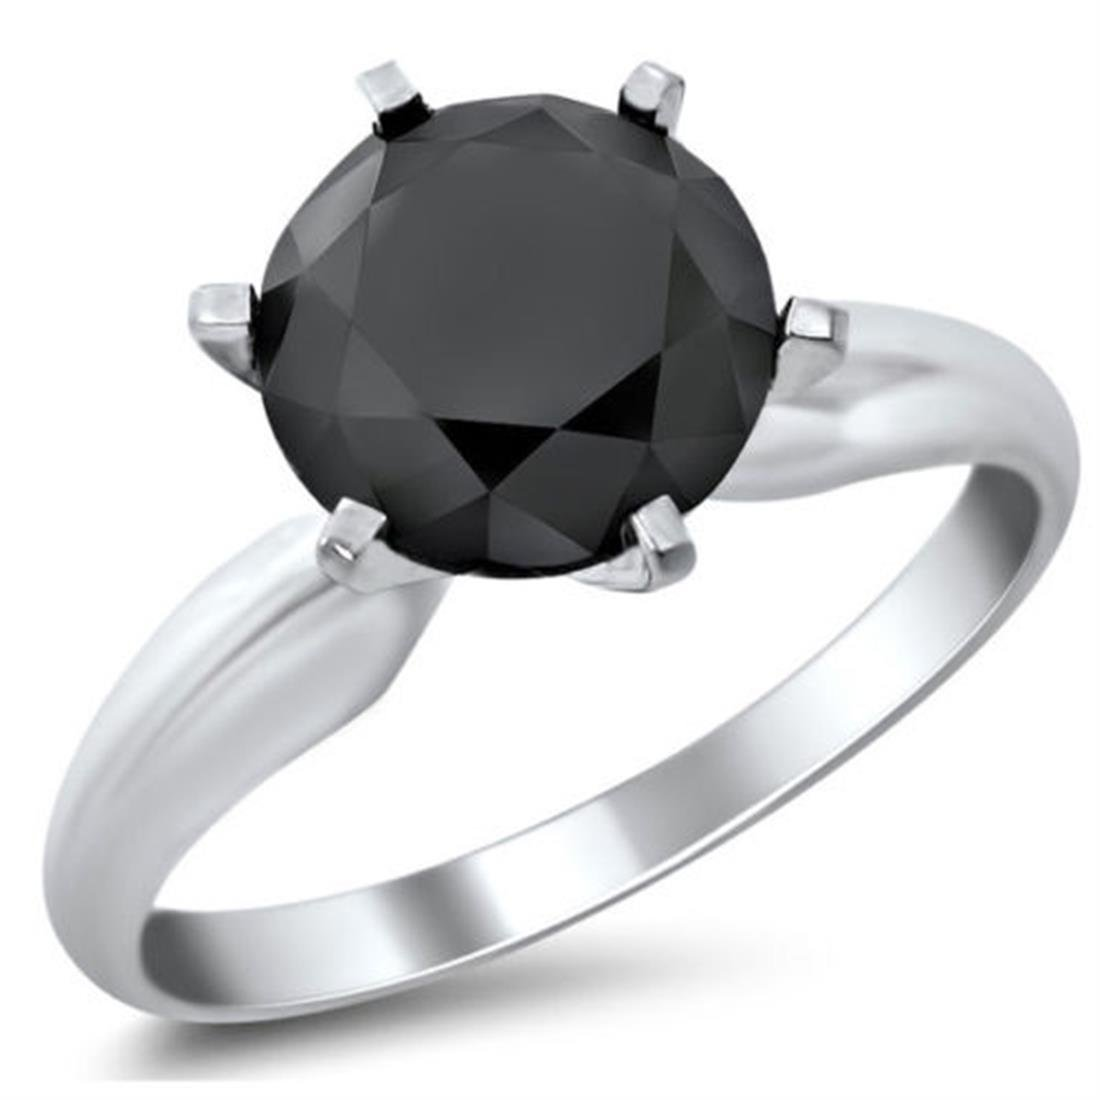 Skyjewels 5 Ct Certified Black Diamond Solitaire Designer Ring in Sterling Silver